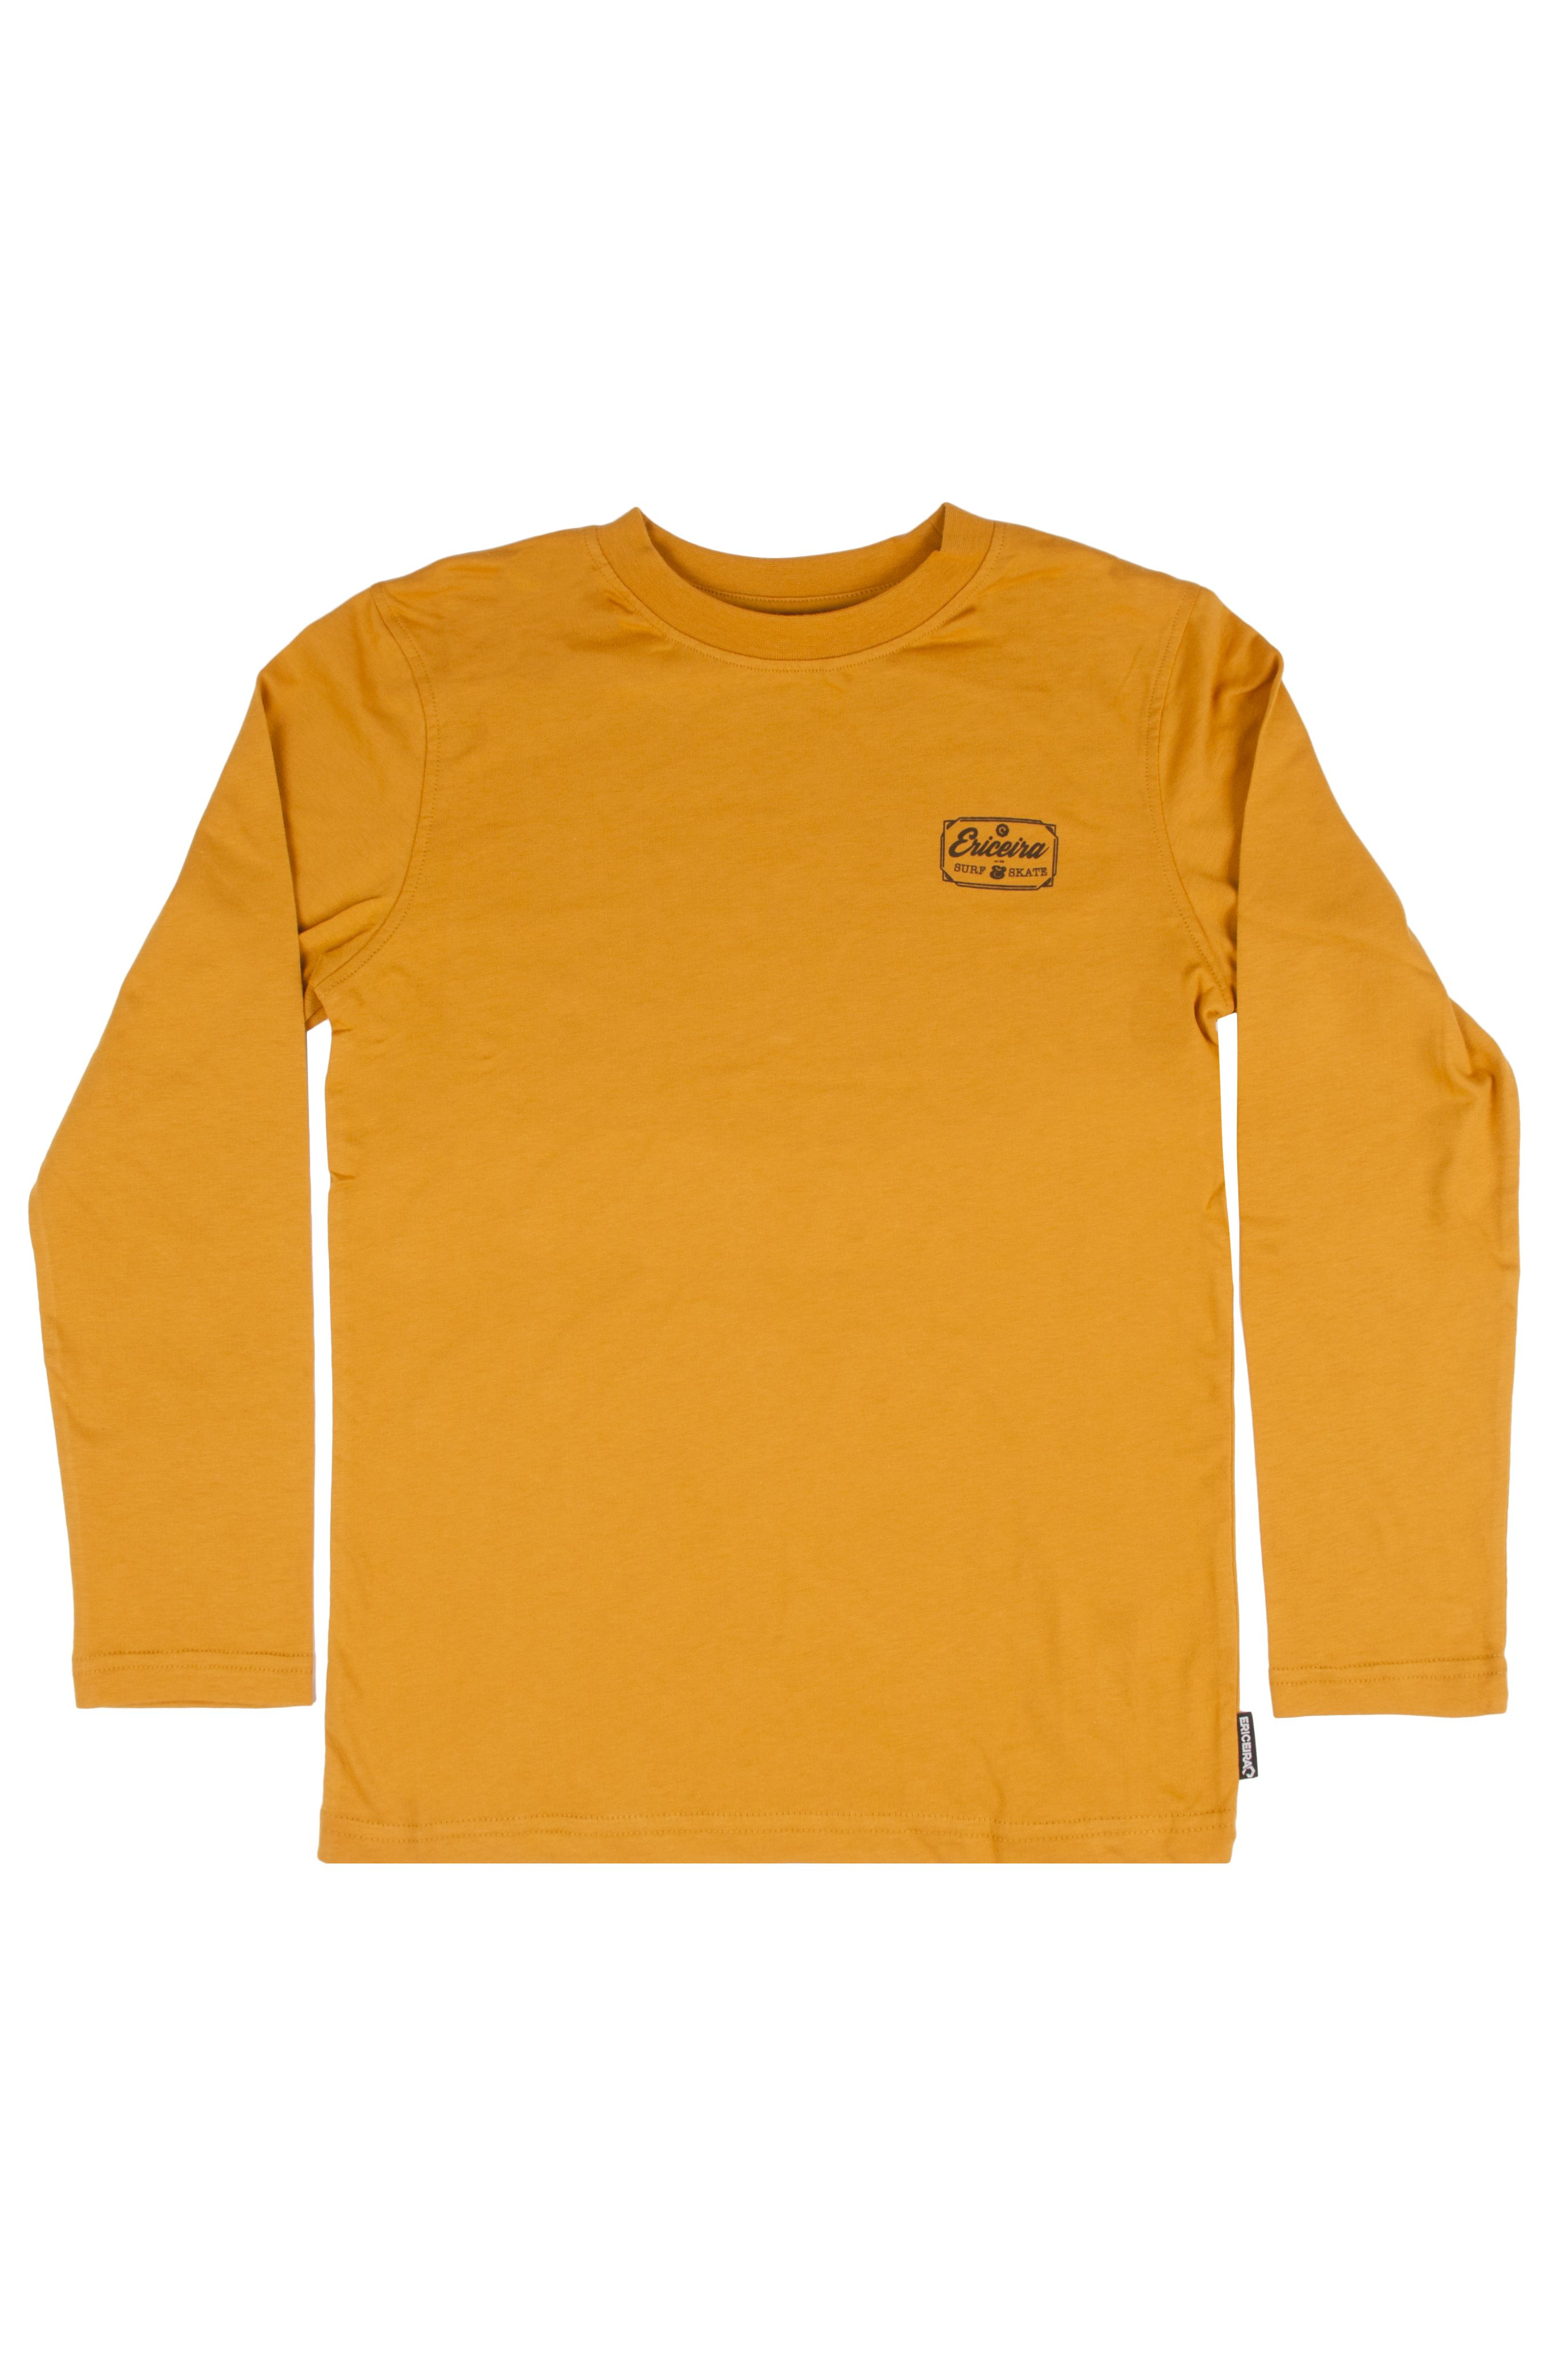 L-Sleeve Ericeira Surf Skate CLASSIC Mustard